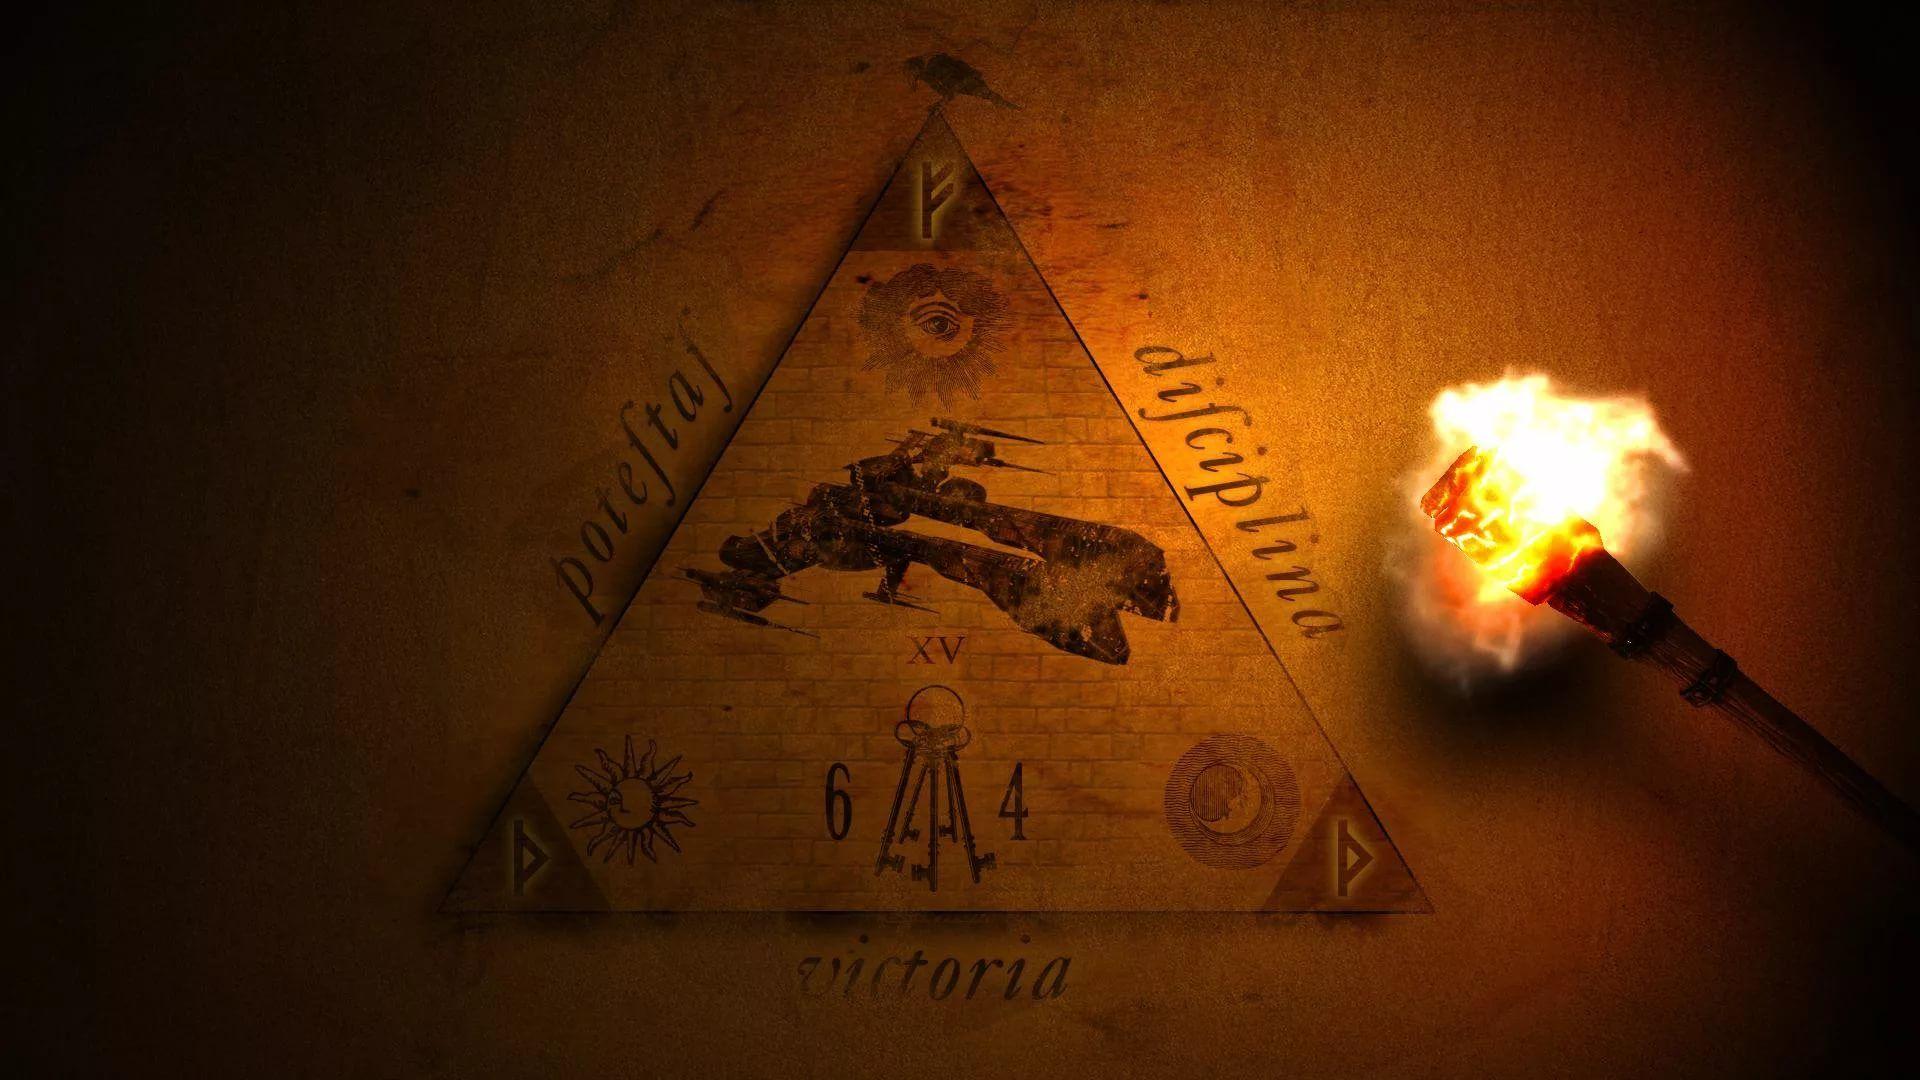 Freemason wallpaper picture hd